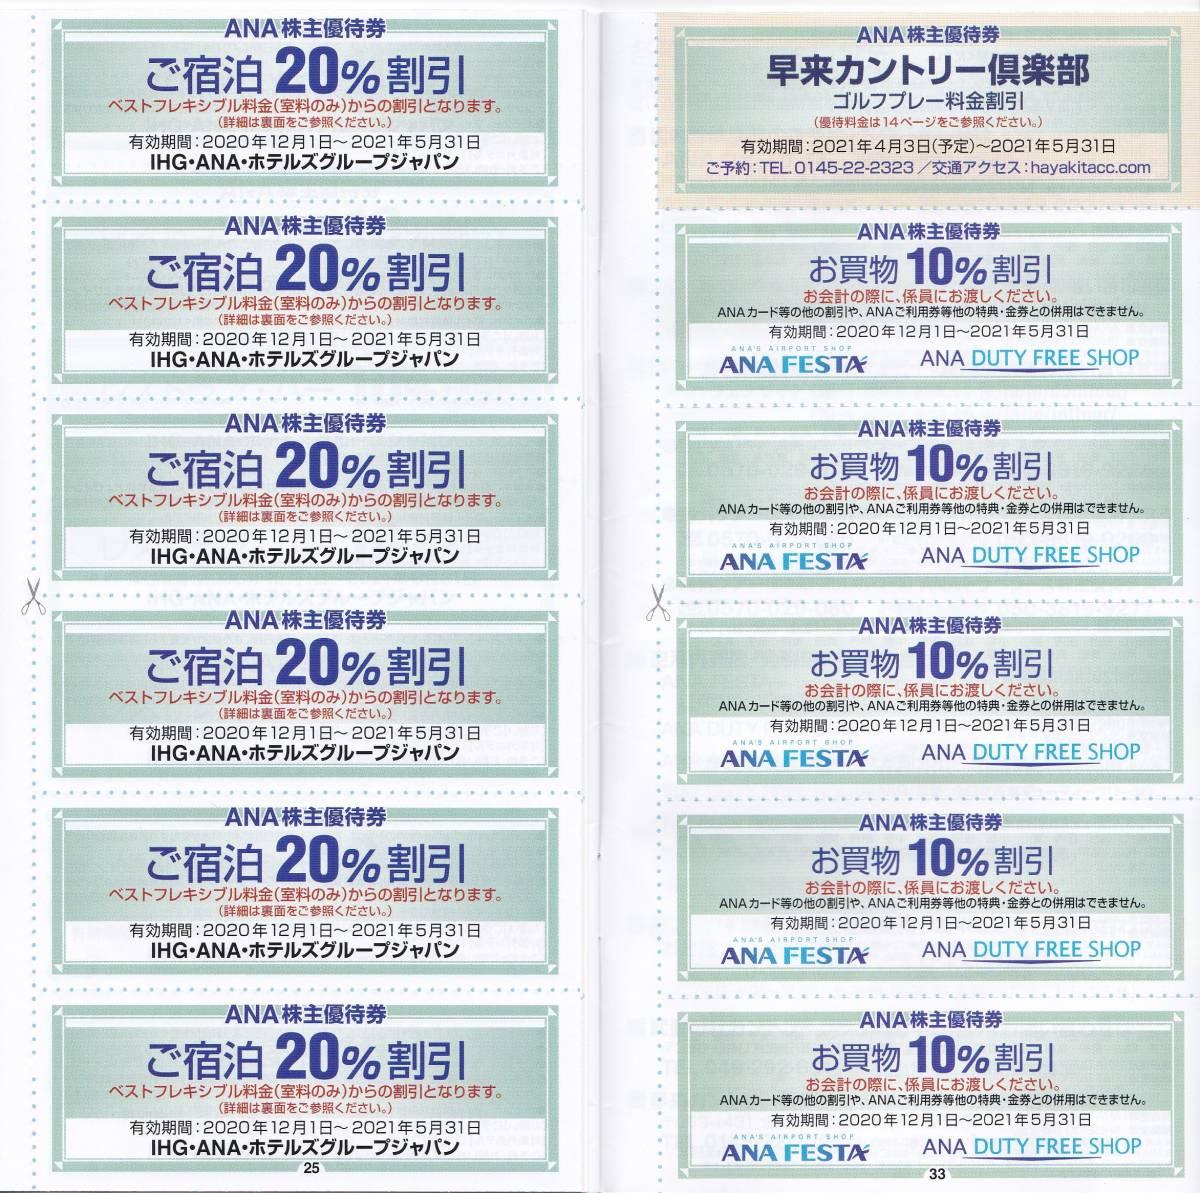 最新 【送料込み260円】 全日空 ANA株主優待券 ホテル20%割引券他(冊子1冊) 2020.12.1~2021.5.31迄_画像2